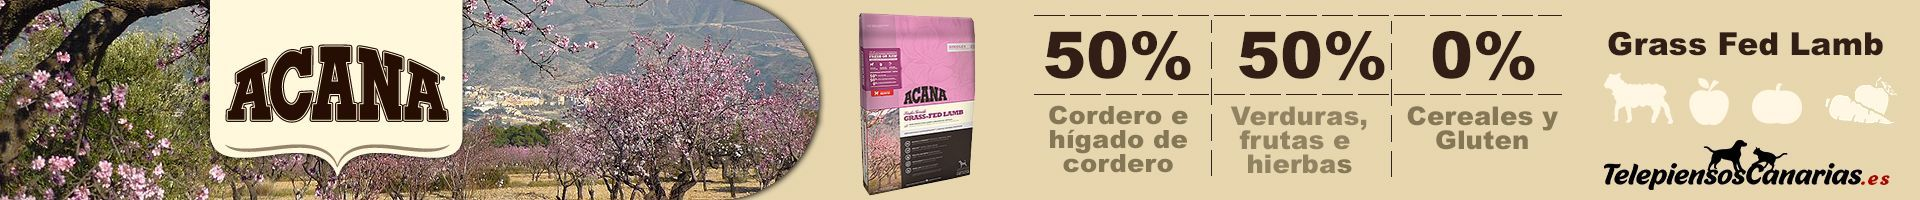 Acana Grass Fed Lamb, 50% de cordero y 50% verduras